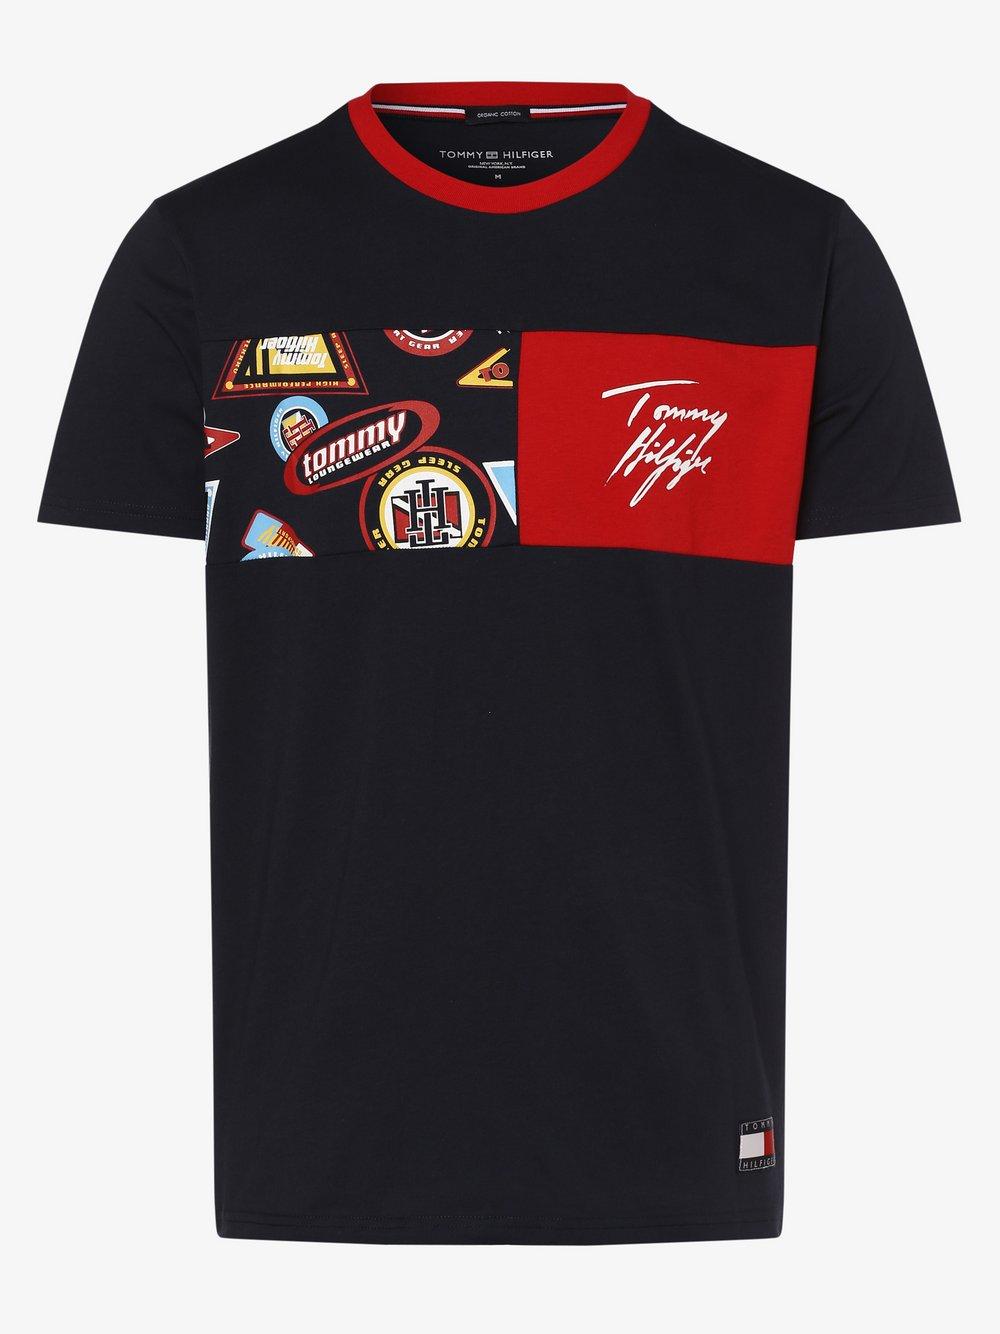 Tommy Hilfiger - Męska koszulka od piżam, niebieski